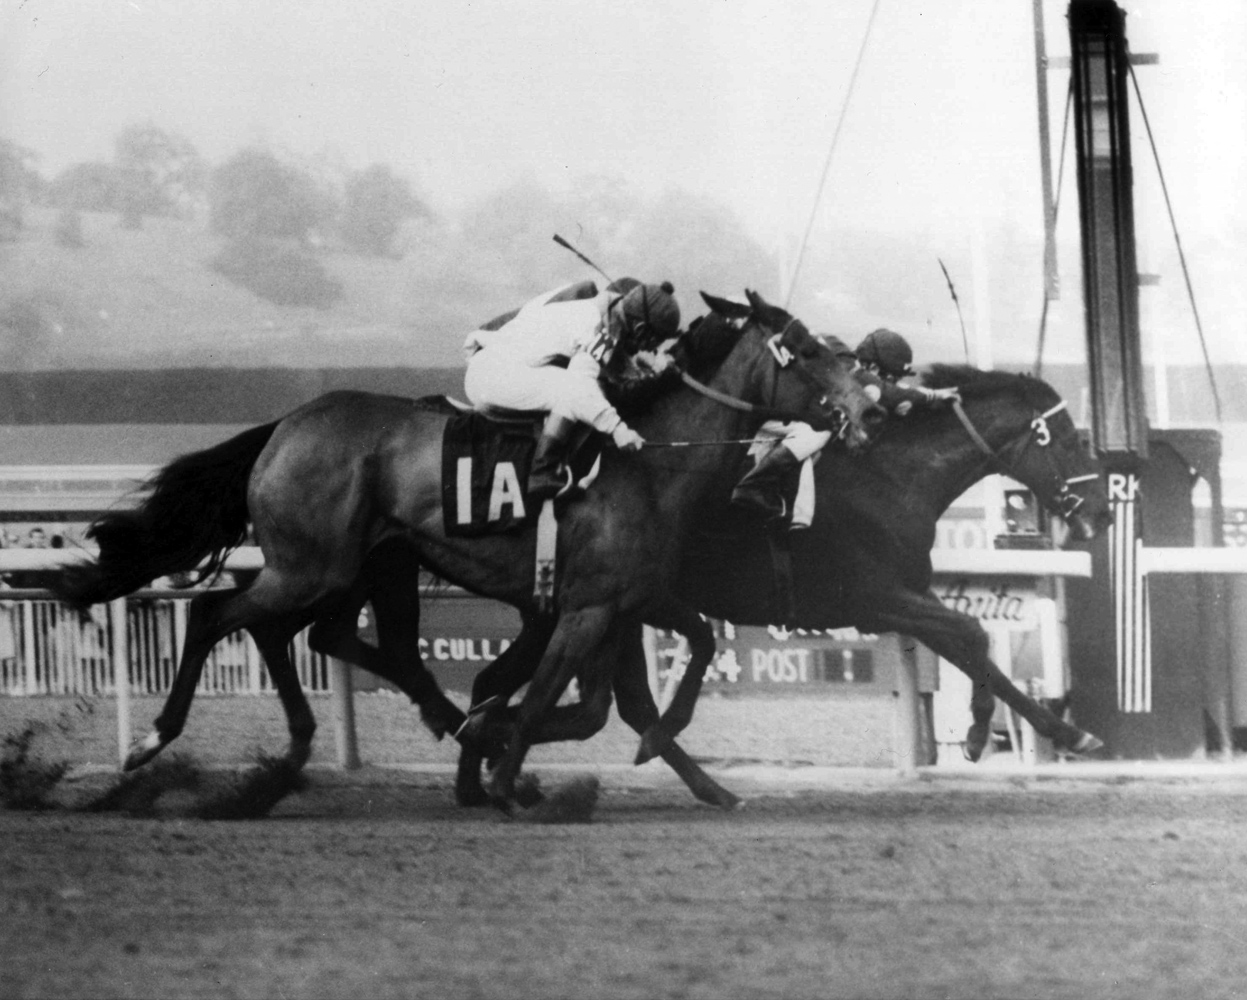 Dark Mirage (Eddie Belmonte up) wins the 1969 Santa Maria Handicap at Santa Anita Park by a nose (Santa Anita Photo/Museum Collection)